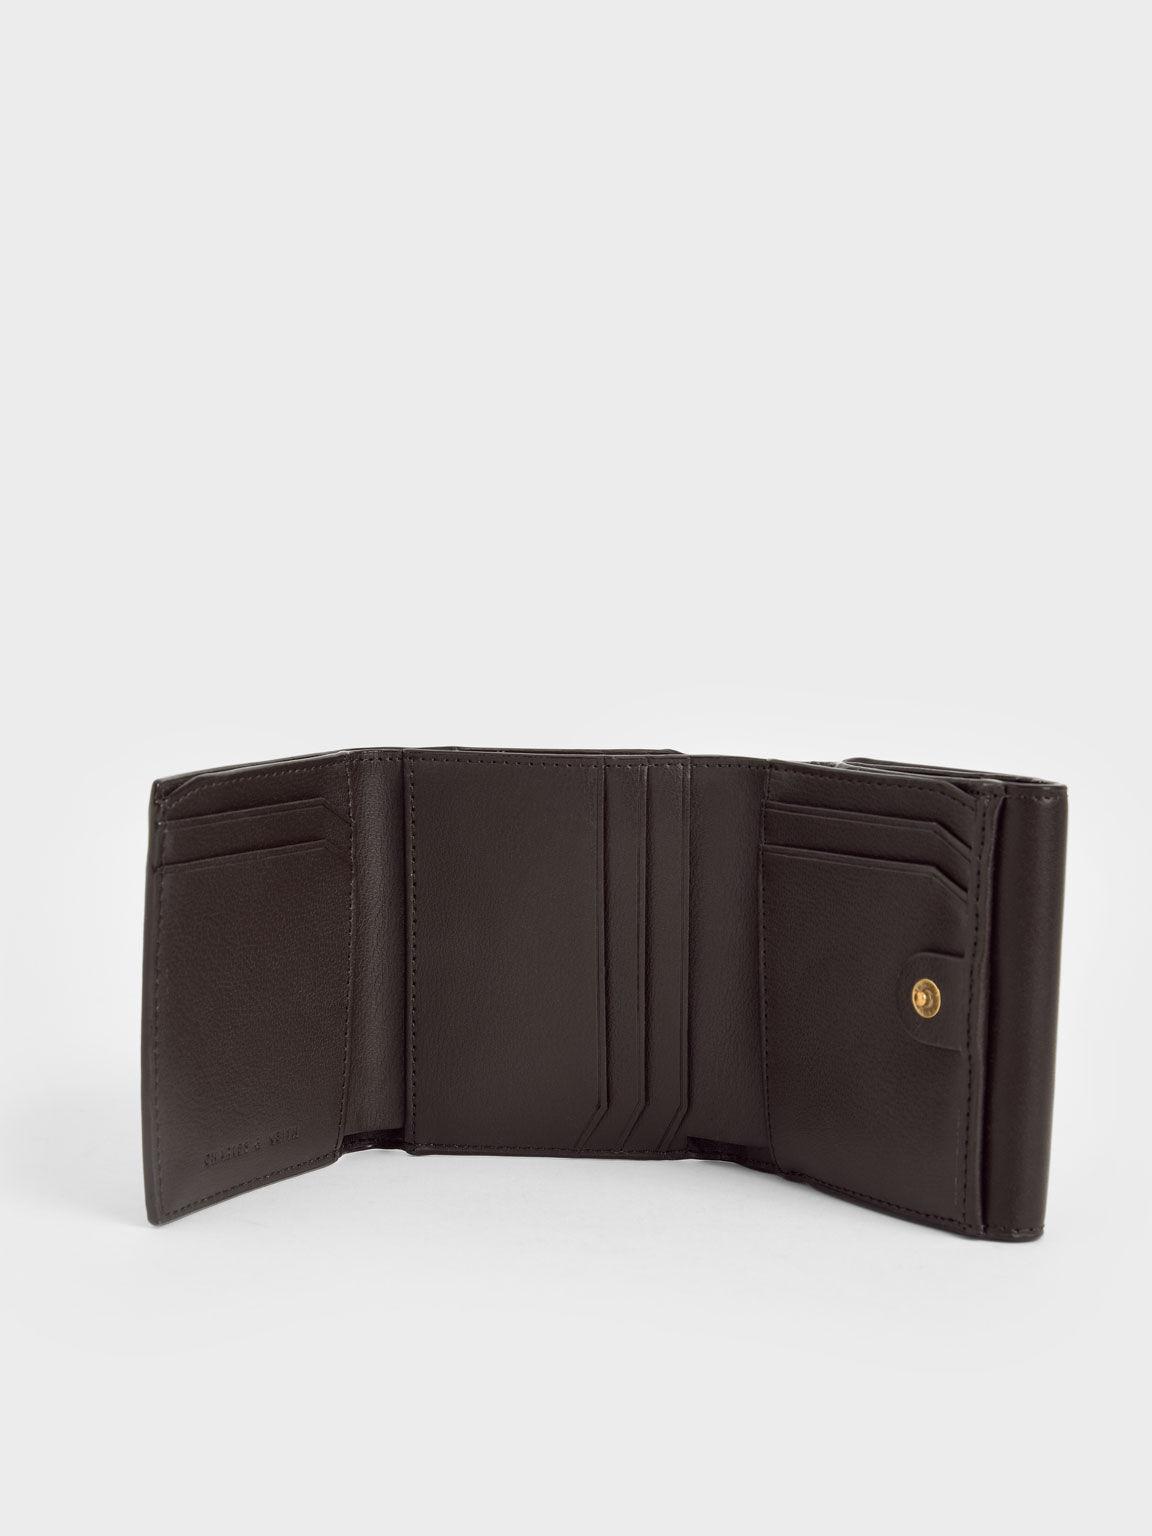 Metallic Turn-Lock Short Wallet, Dark Oak, hi-res